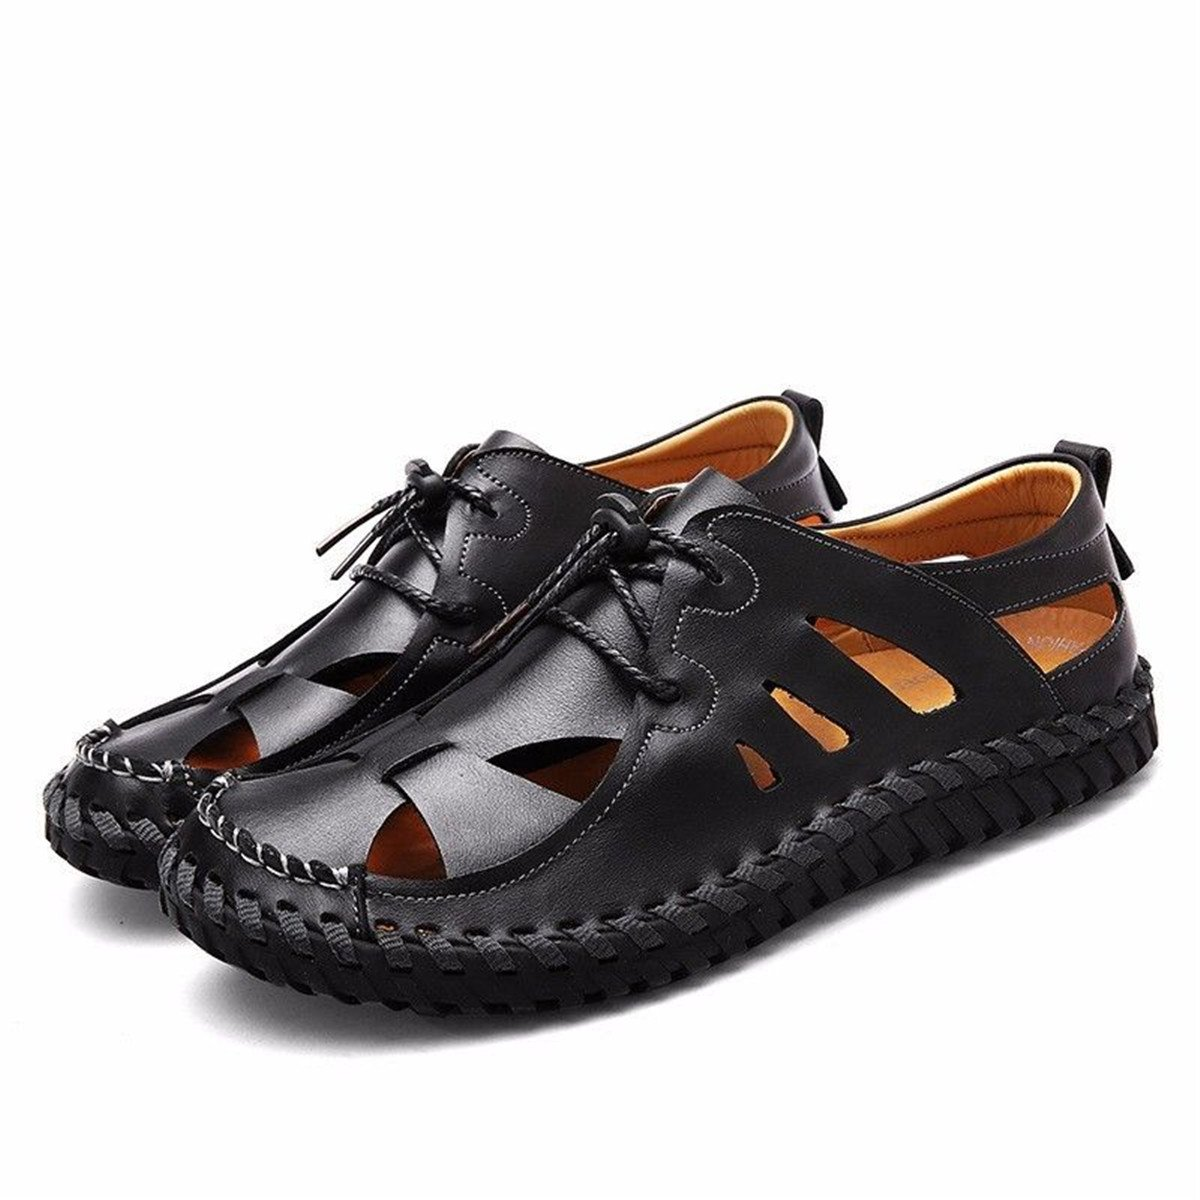 BININBOX Men's Flat Sandals Summer Breathable Shoe Closed-Toe Soft Sport Shoelaces (7 B(M) US, Black)